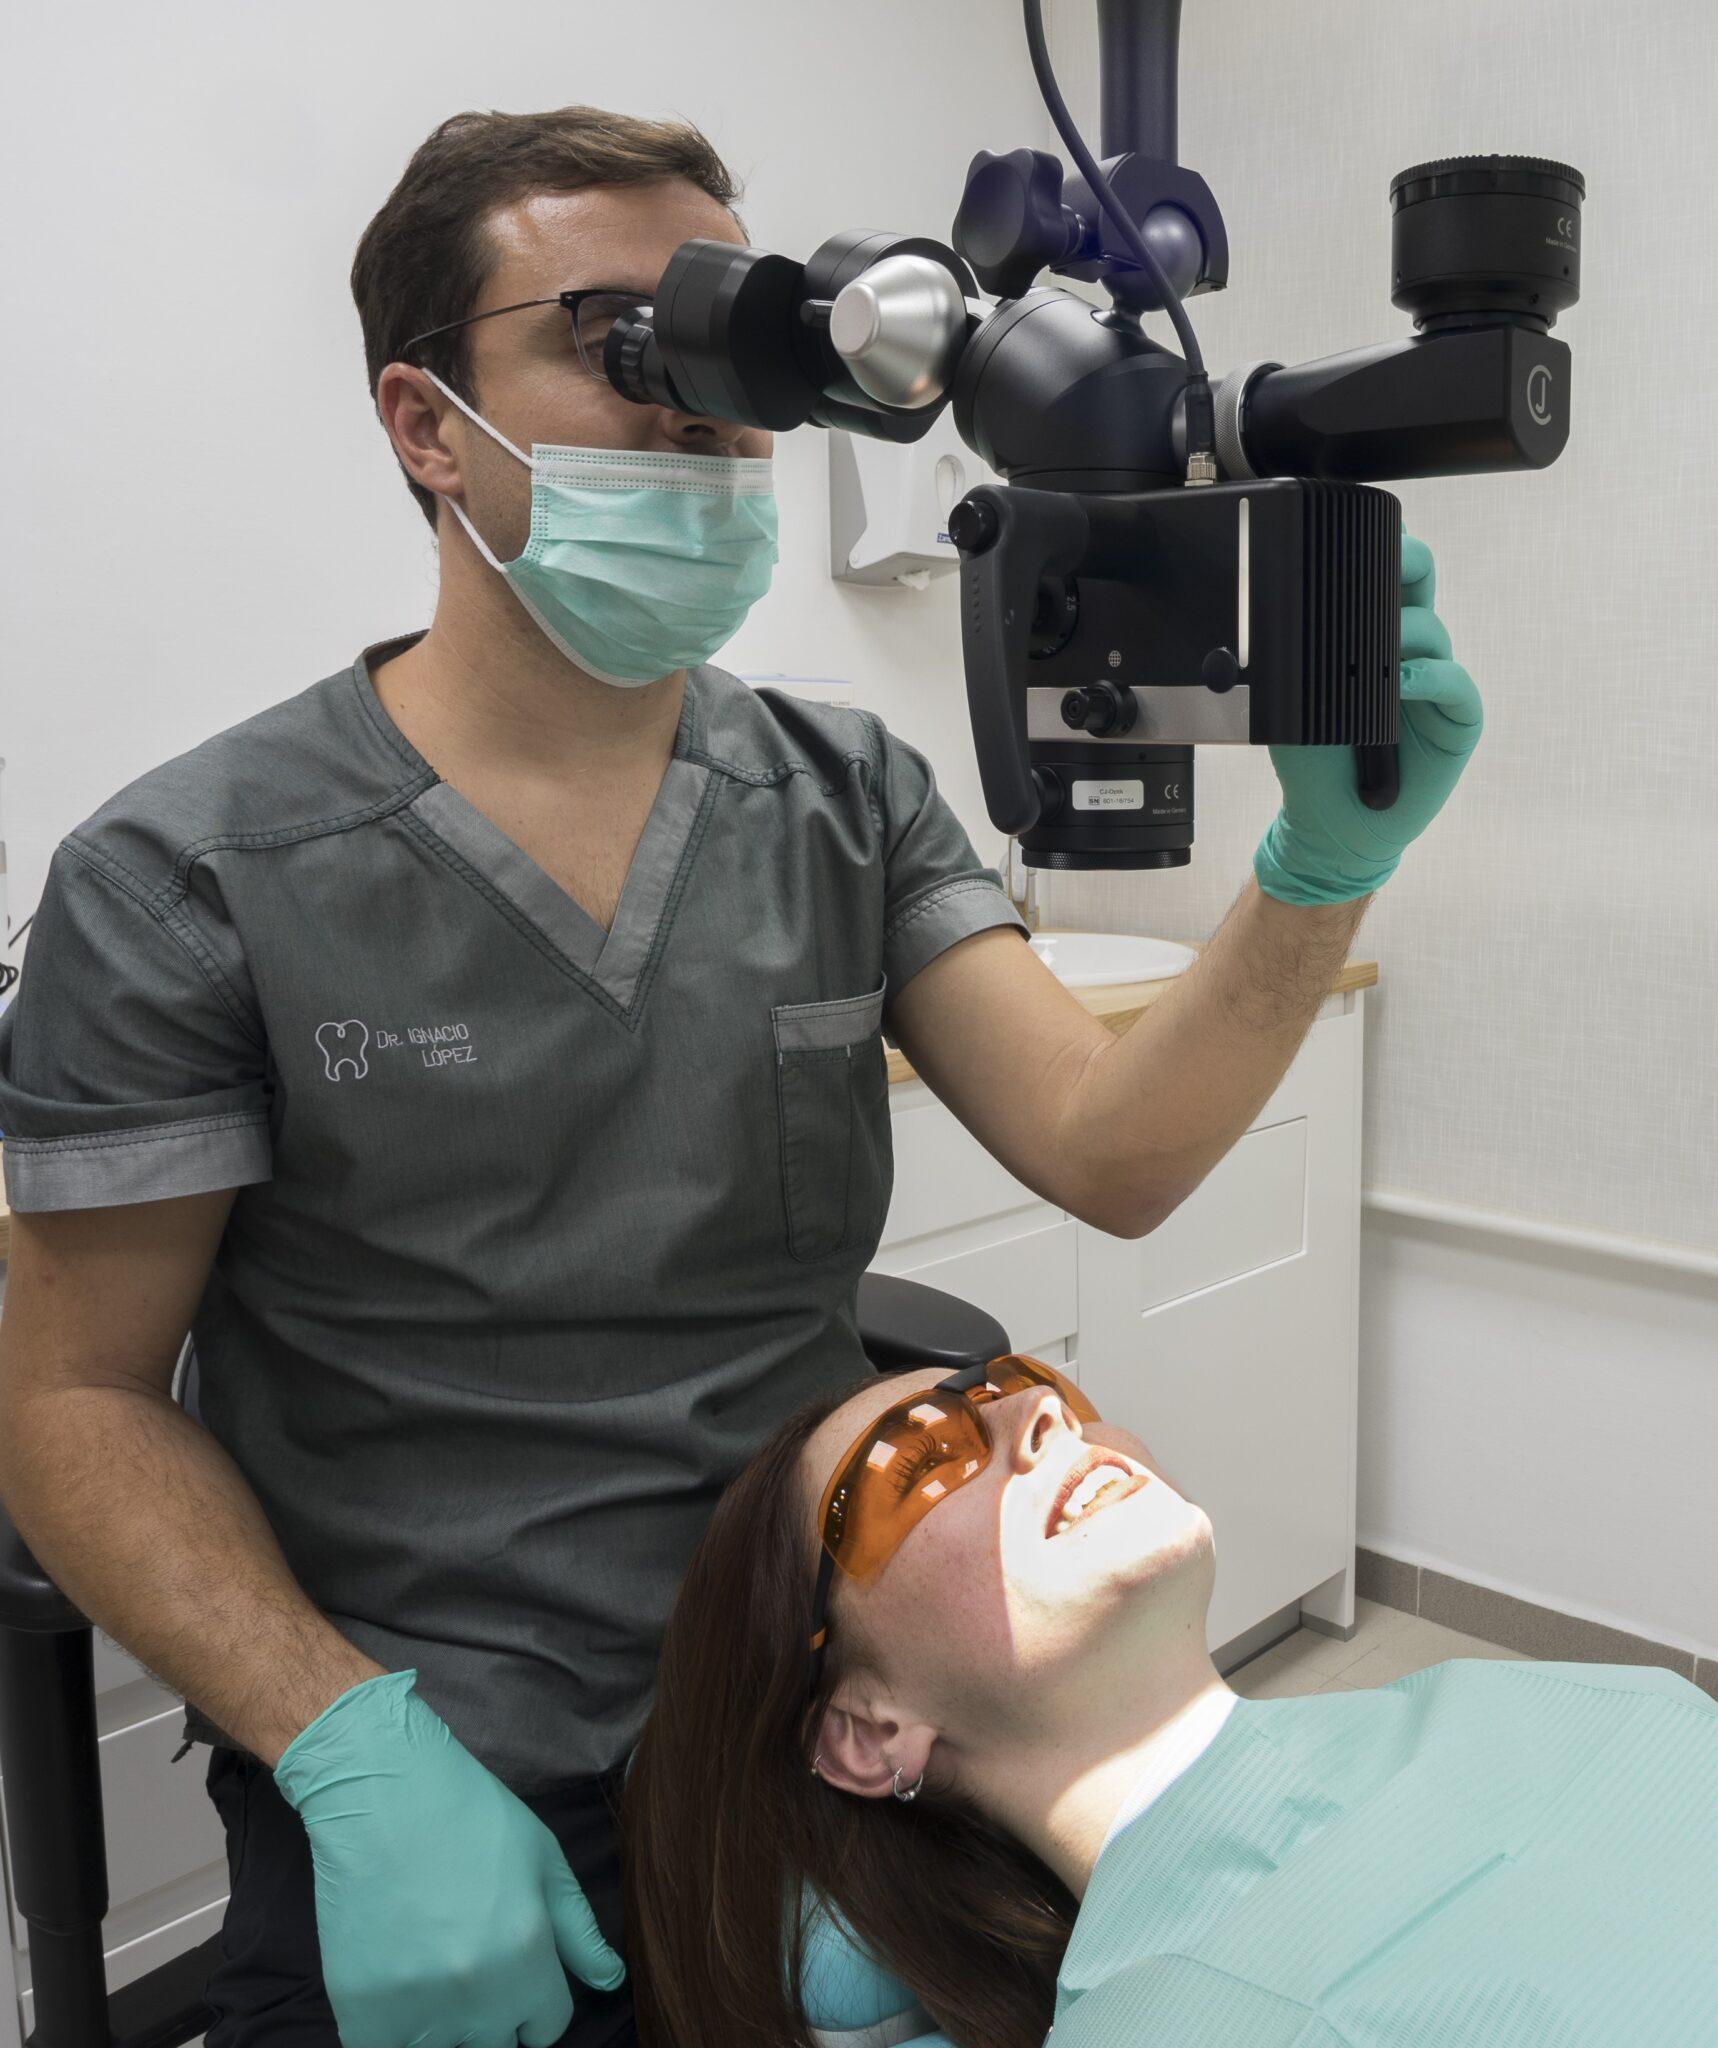 tratamiento anestesia dental murcia